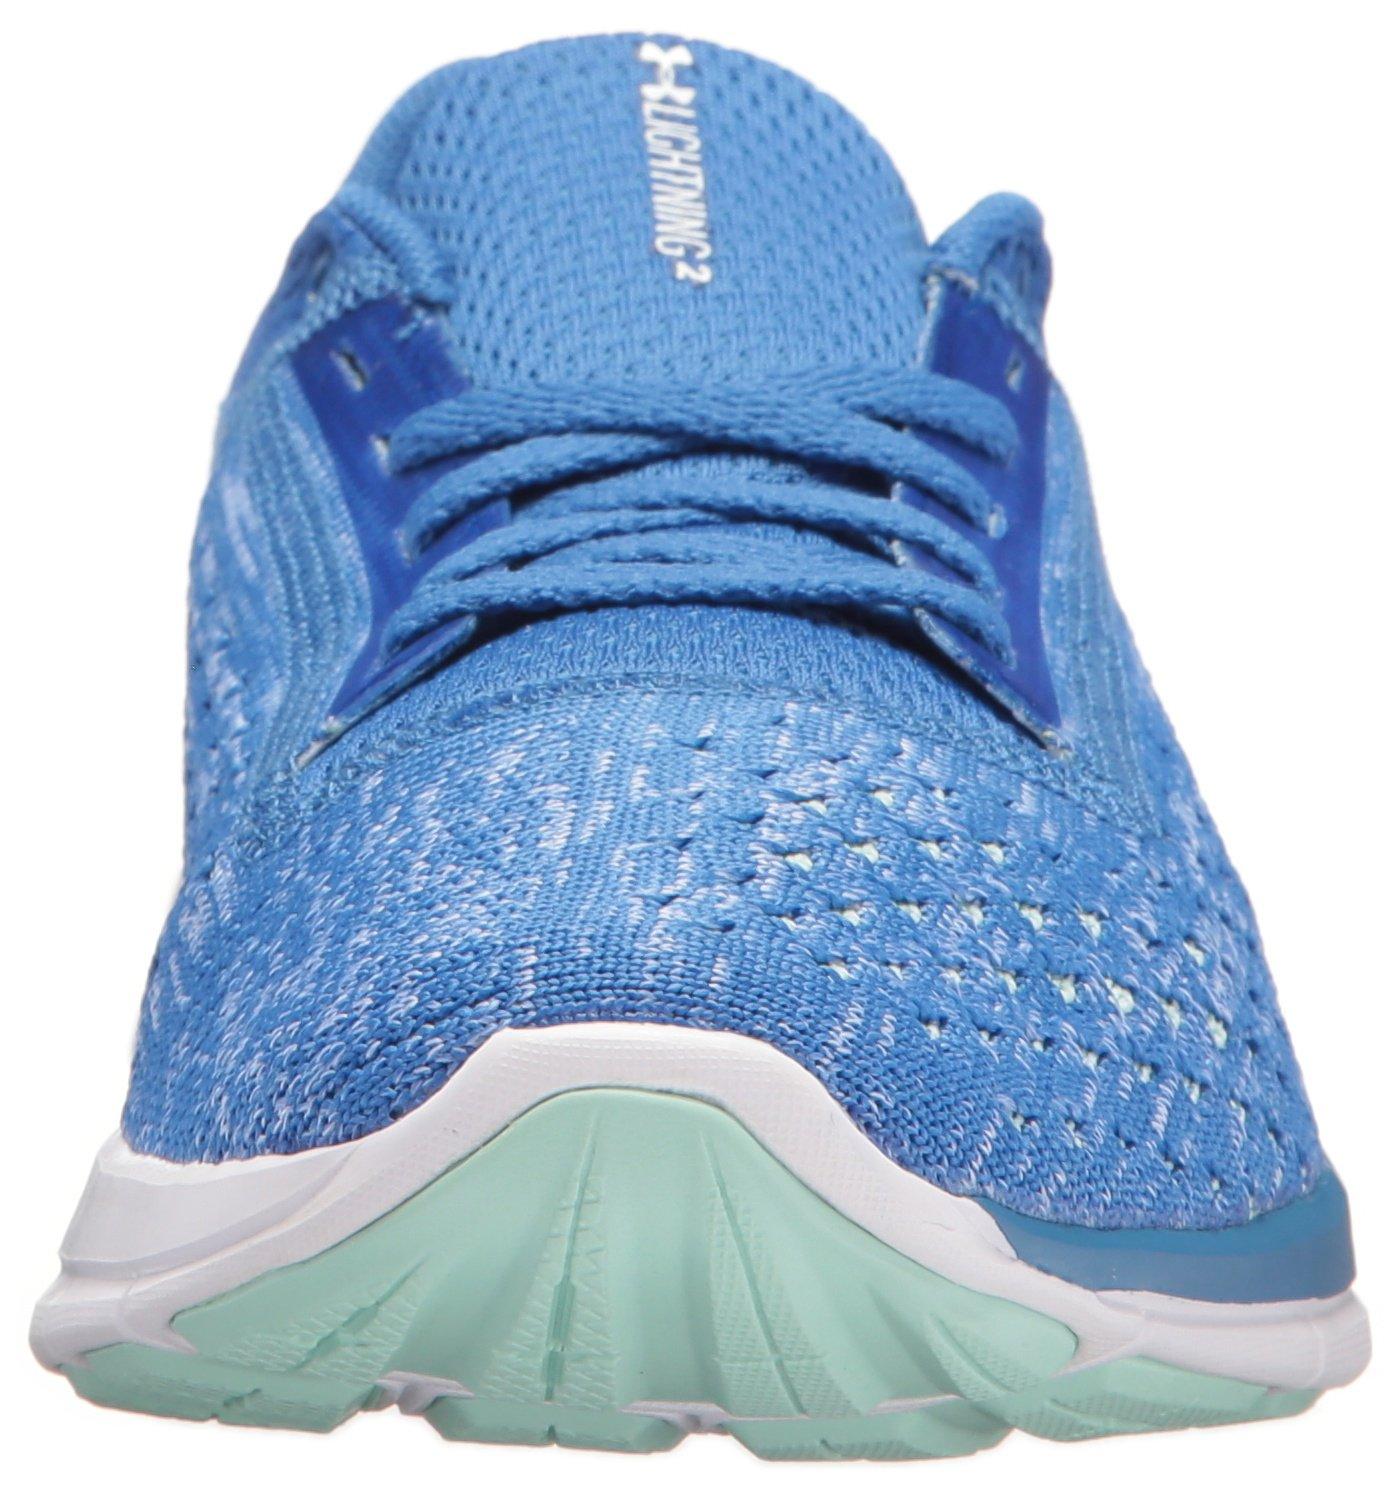 pretty nice 85996 94794 Nike SB Trainerendor Premium Mens Size 8 White Gum  812975-144 ,